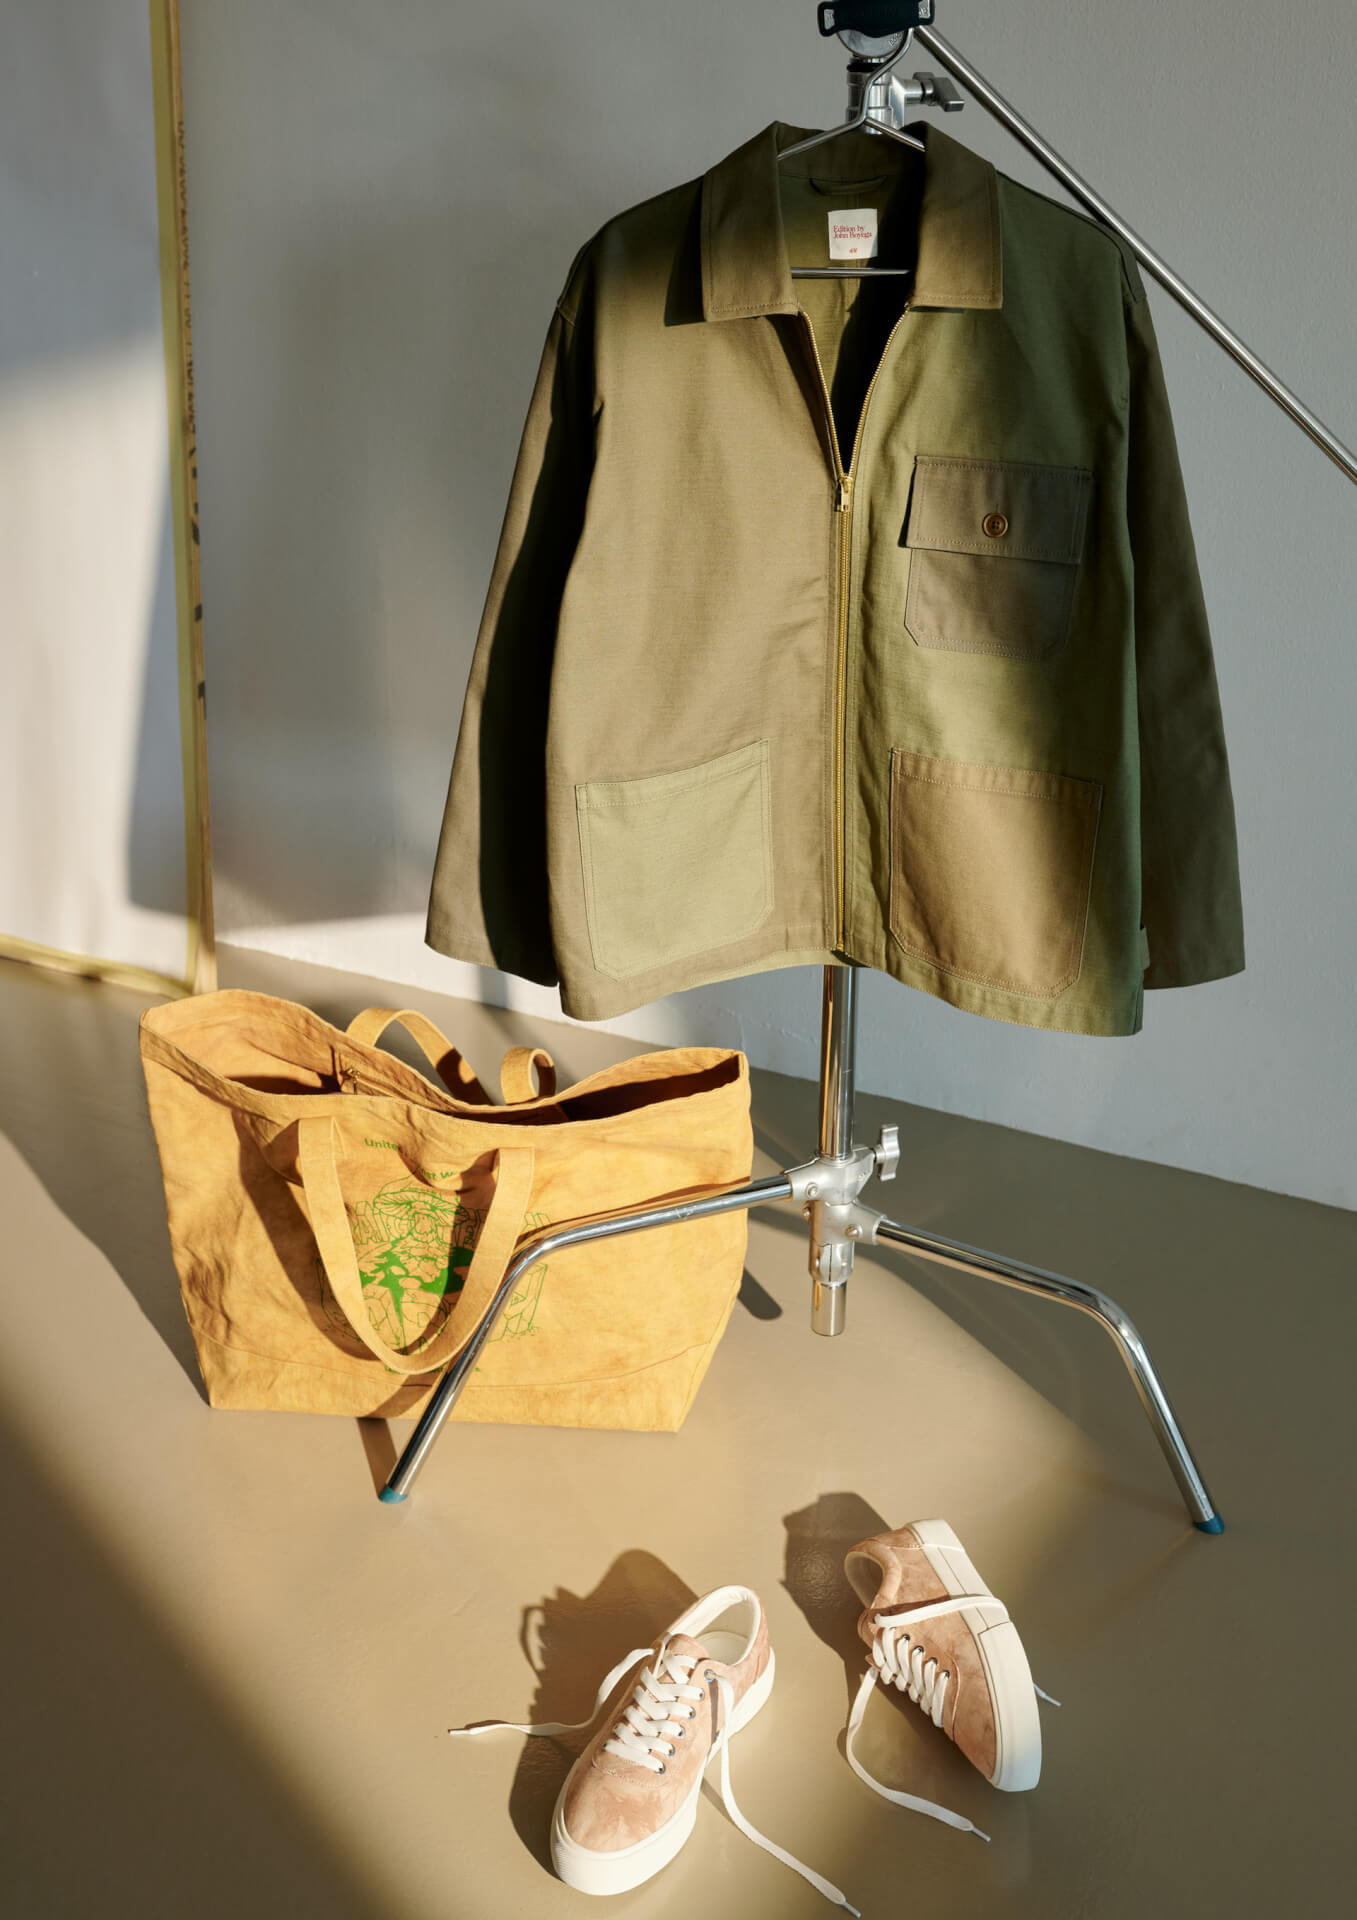 H&Mが俳優のジョン・ボイエガとタッグを組んだメンズウェアコレクションを発表!リサイクル素材、オーガニック素材を使用したアイテムが登場 life211006_handm_john_boyega_06